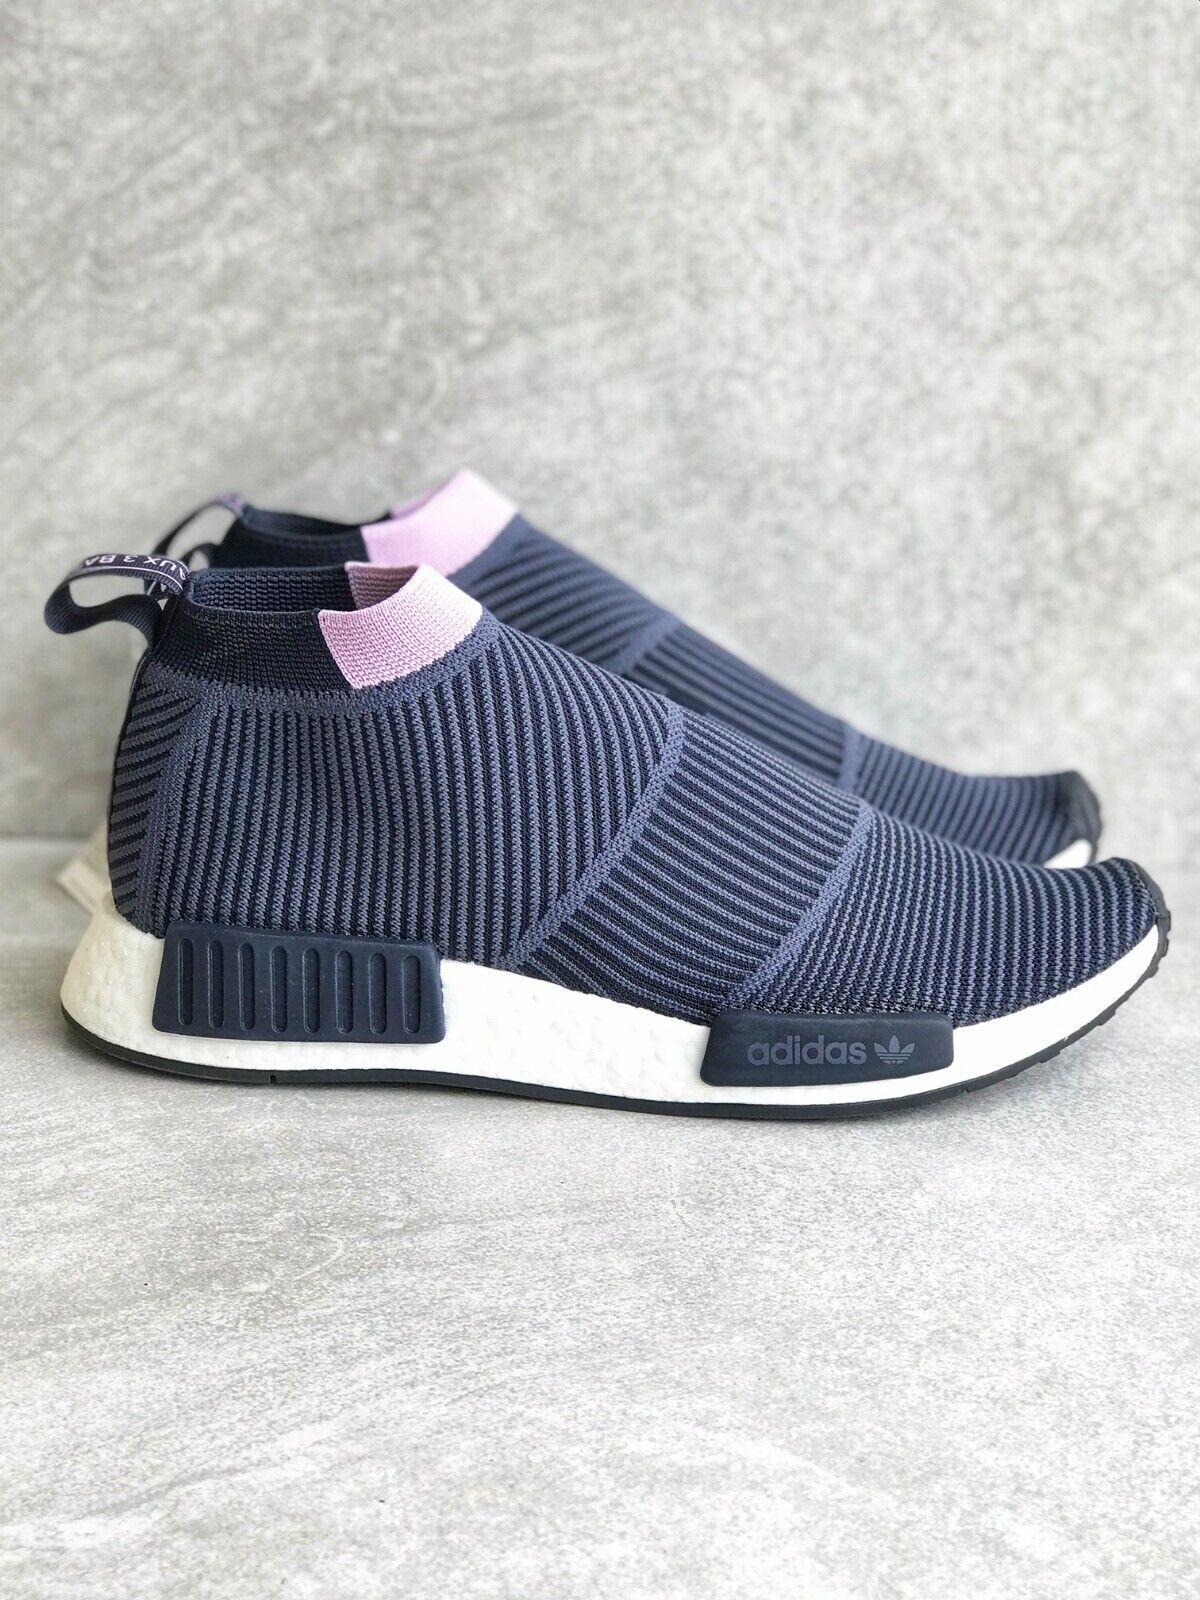 ADIDAS NMD CS1 Primeknit Sneakers Navy Womens B37657 CITY SO